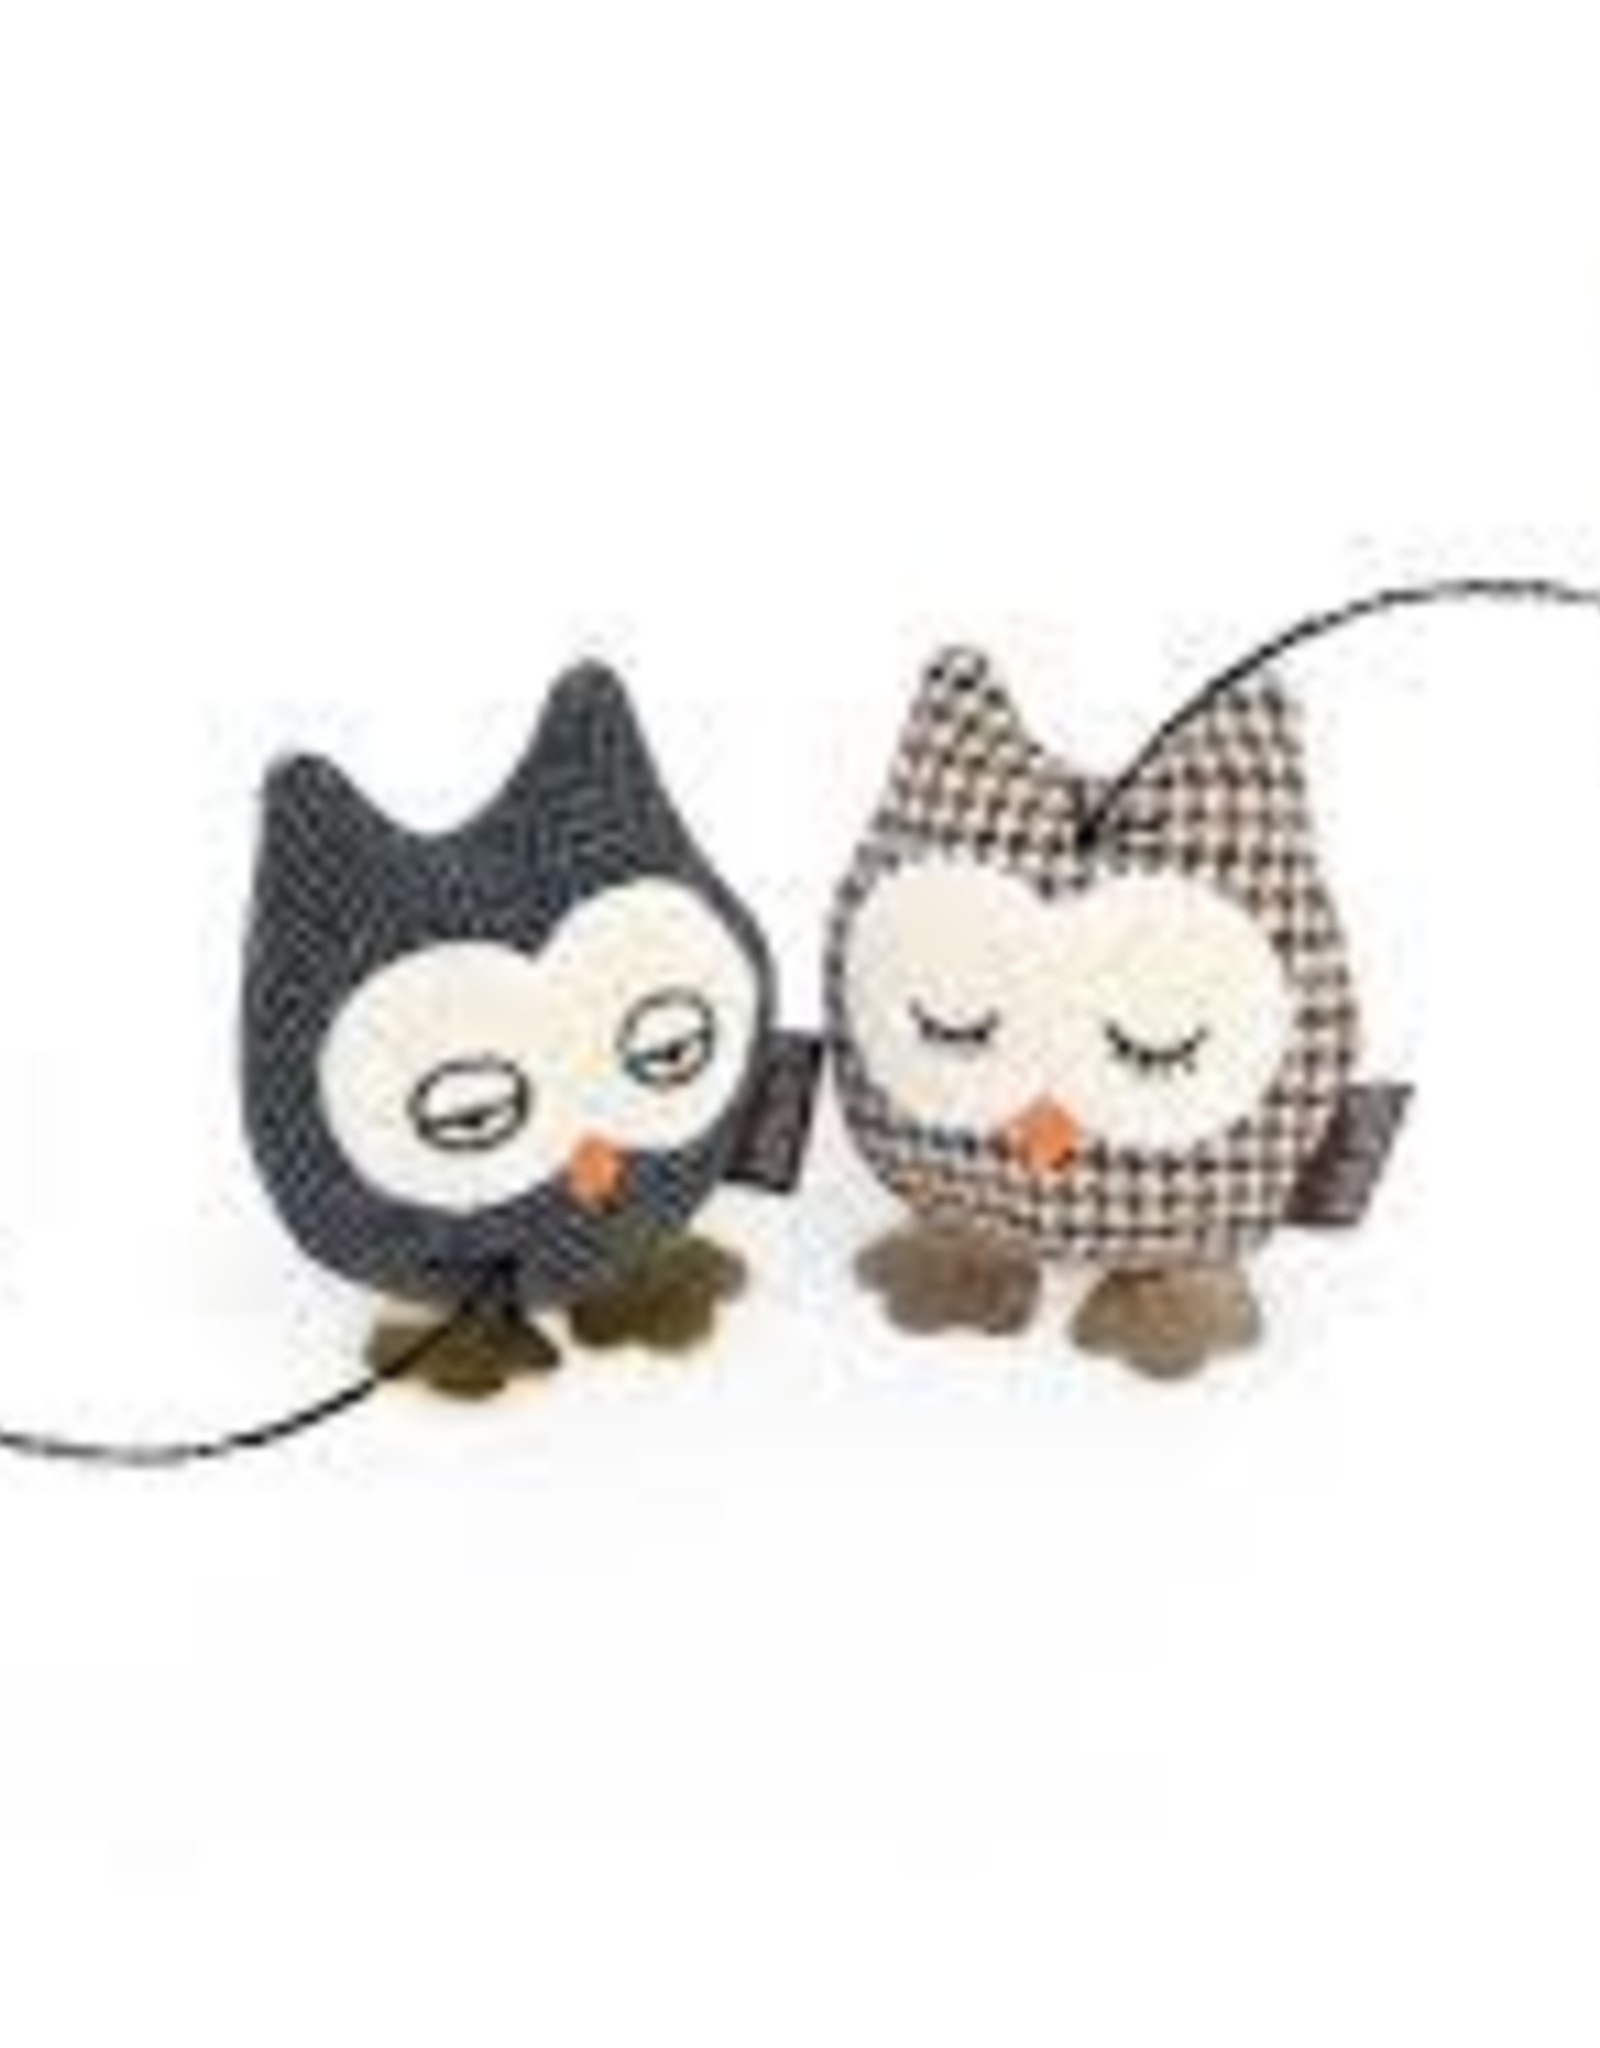 Pet Play Pet Play Feline Frenzy Plush Catnip Owl 2 pk